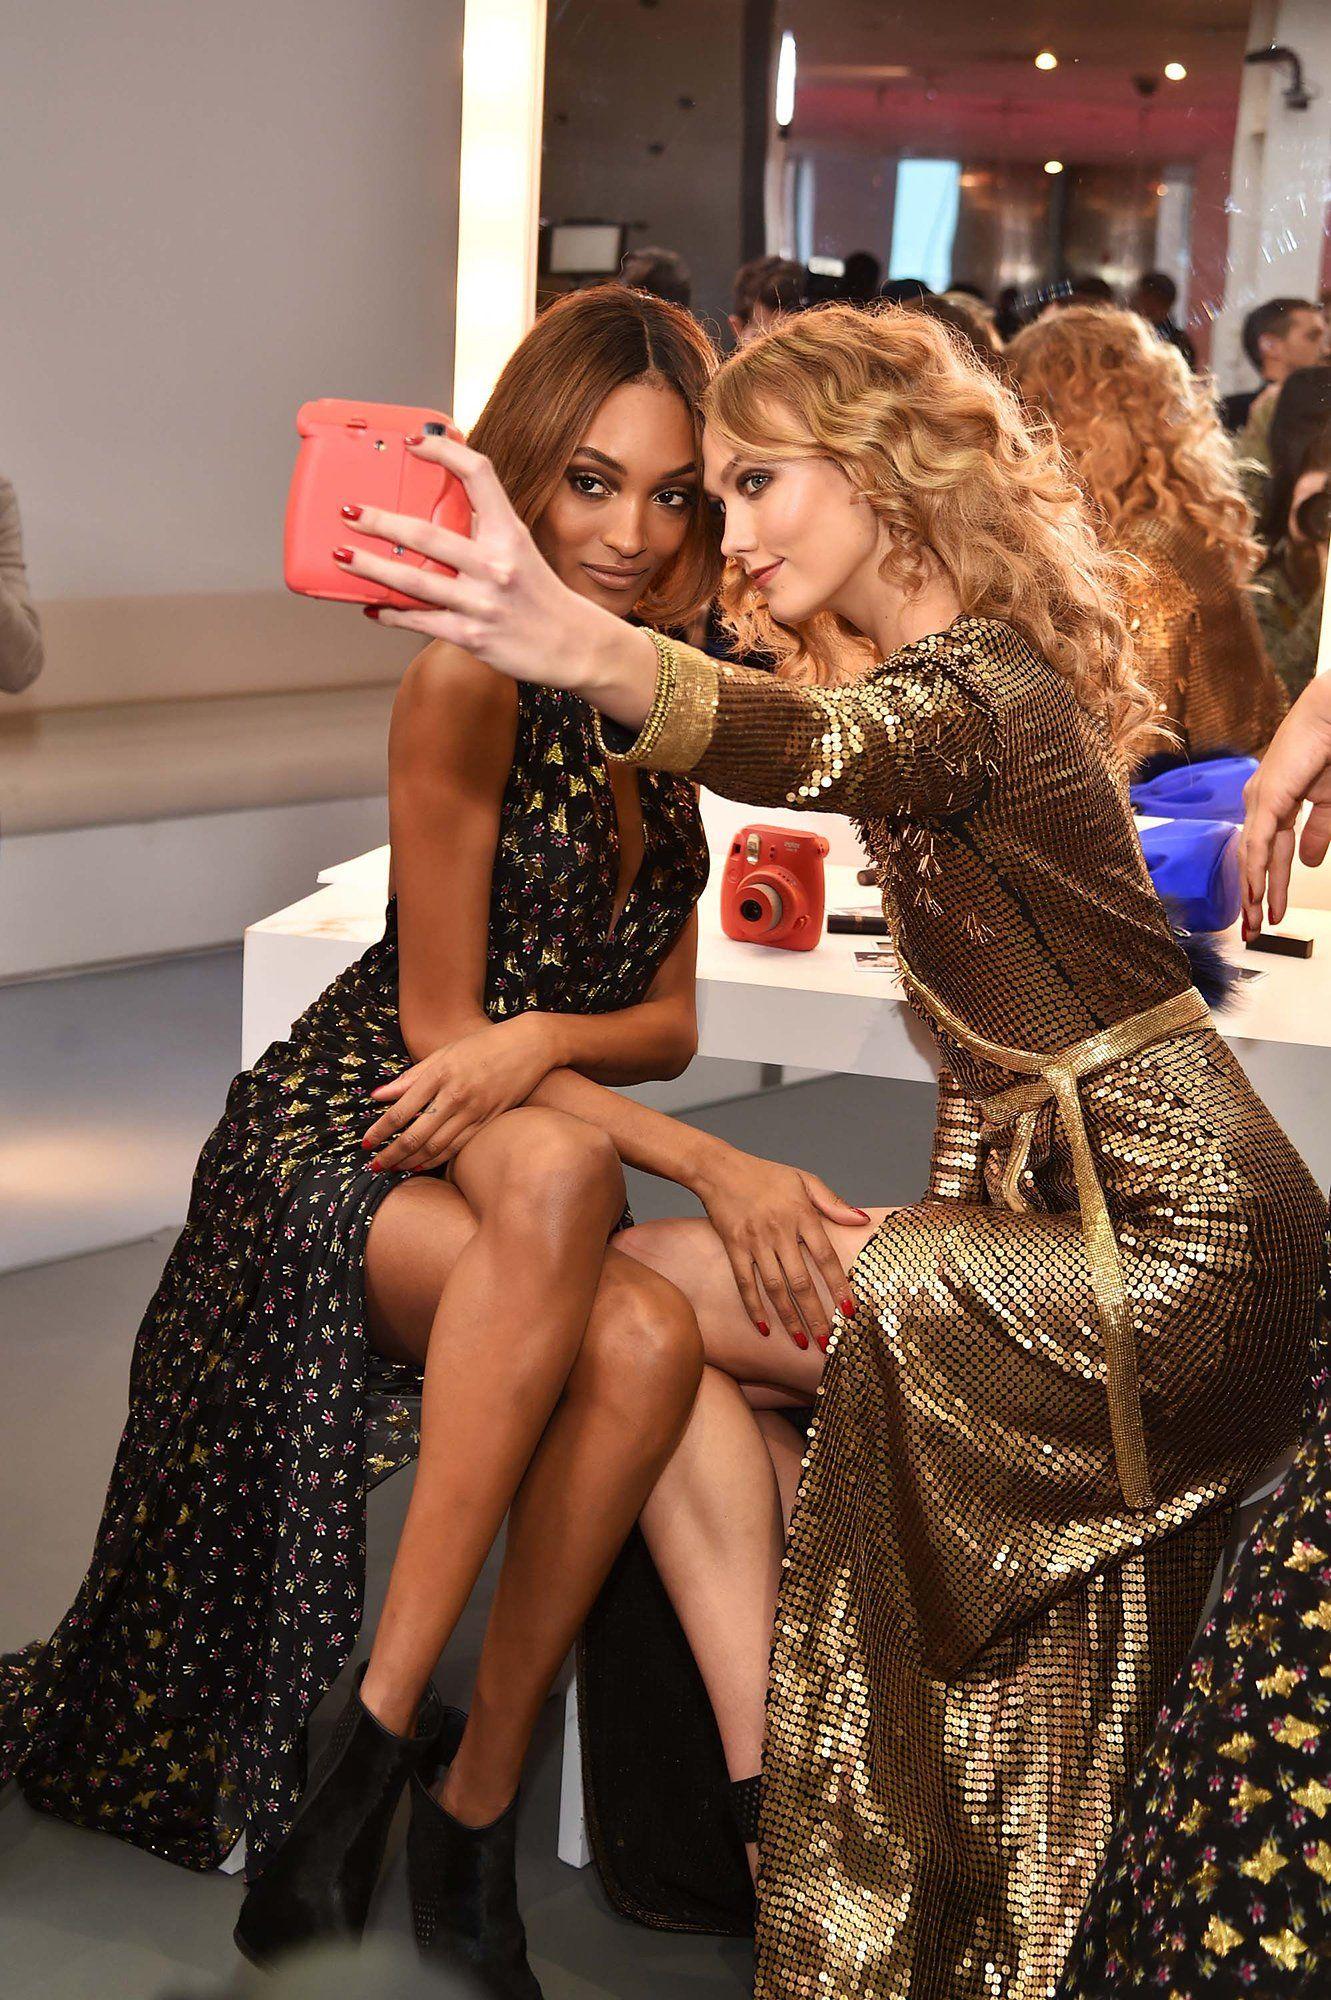 68cfb56074 Karlie Kloss and Jourdan Dunn Don t Need a Hashtag to Prove Their Friendship